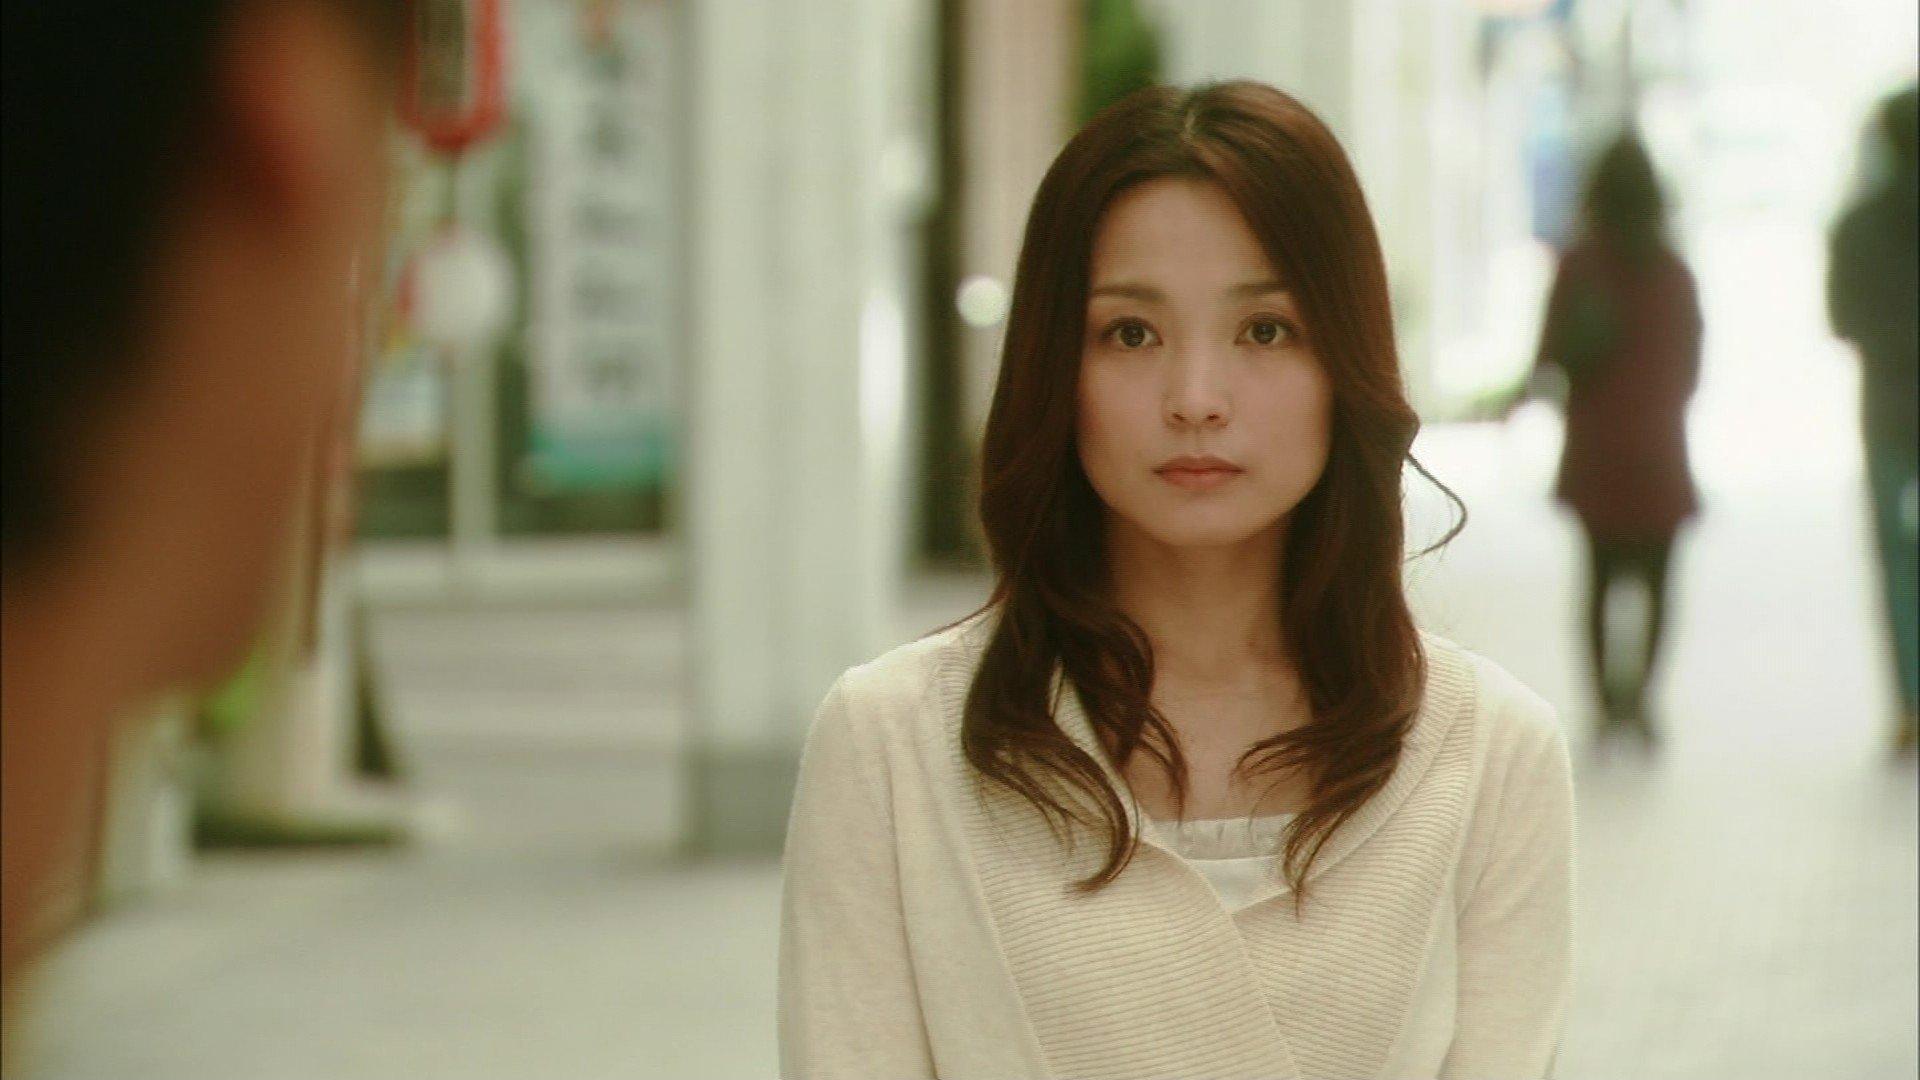 kuninaka ryoko kiss scene 08dd2d21 - 国仲涼子のキスシーンが凄いらしい!話題のキスシーン徹底研究